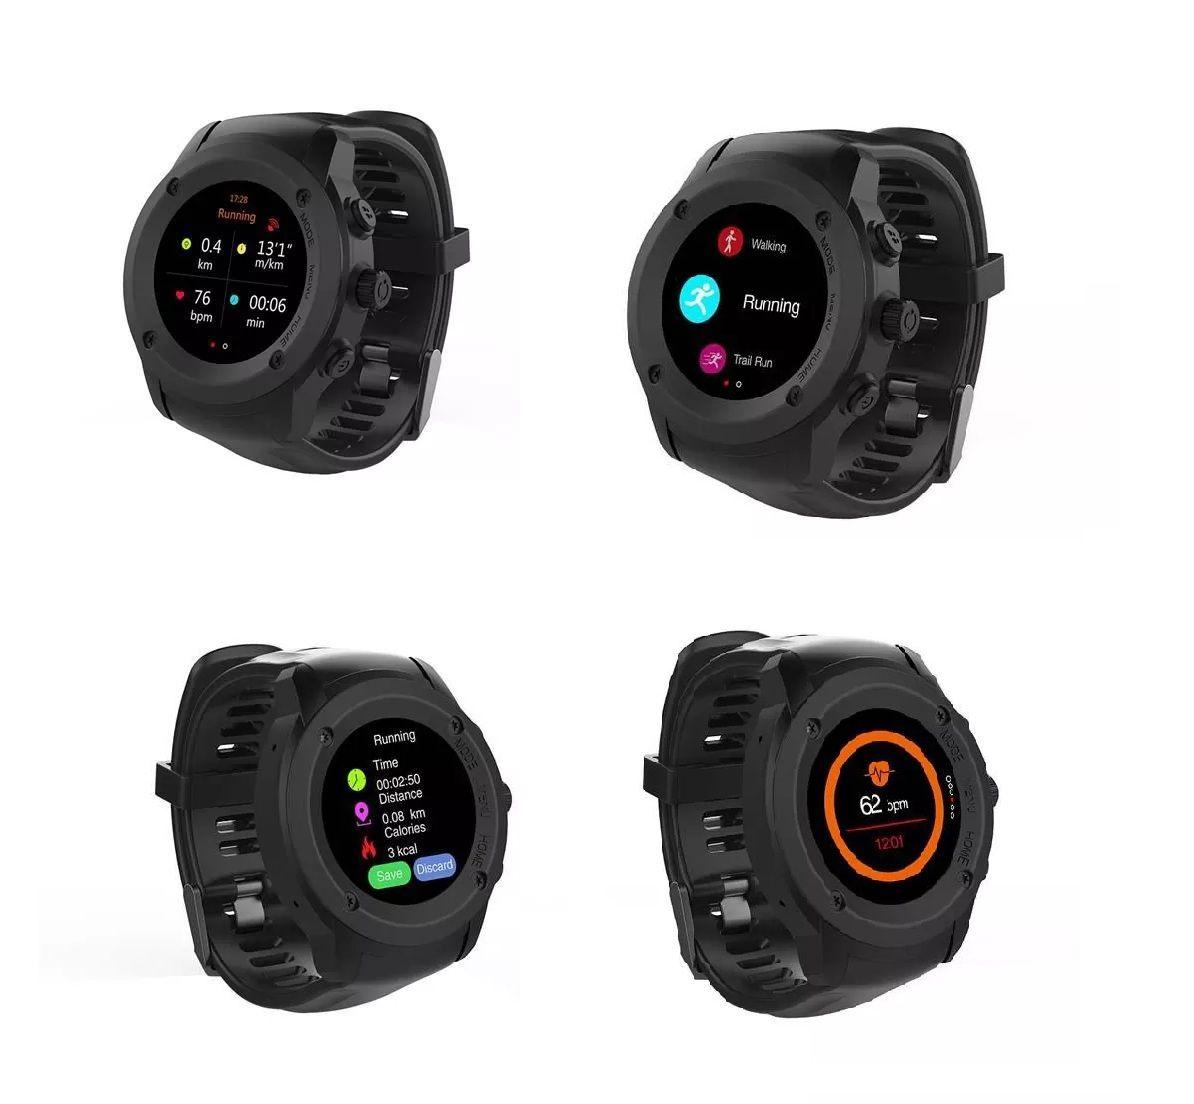 Smartwatch Multilaser Relógio SW2 Plus GPS Bluetooth Tela Touchscreen Leitura de mensagem Monitor cardíaco APP exclusivo IOS/Android - P9080